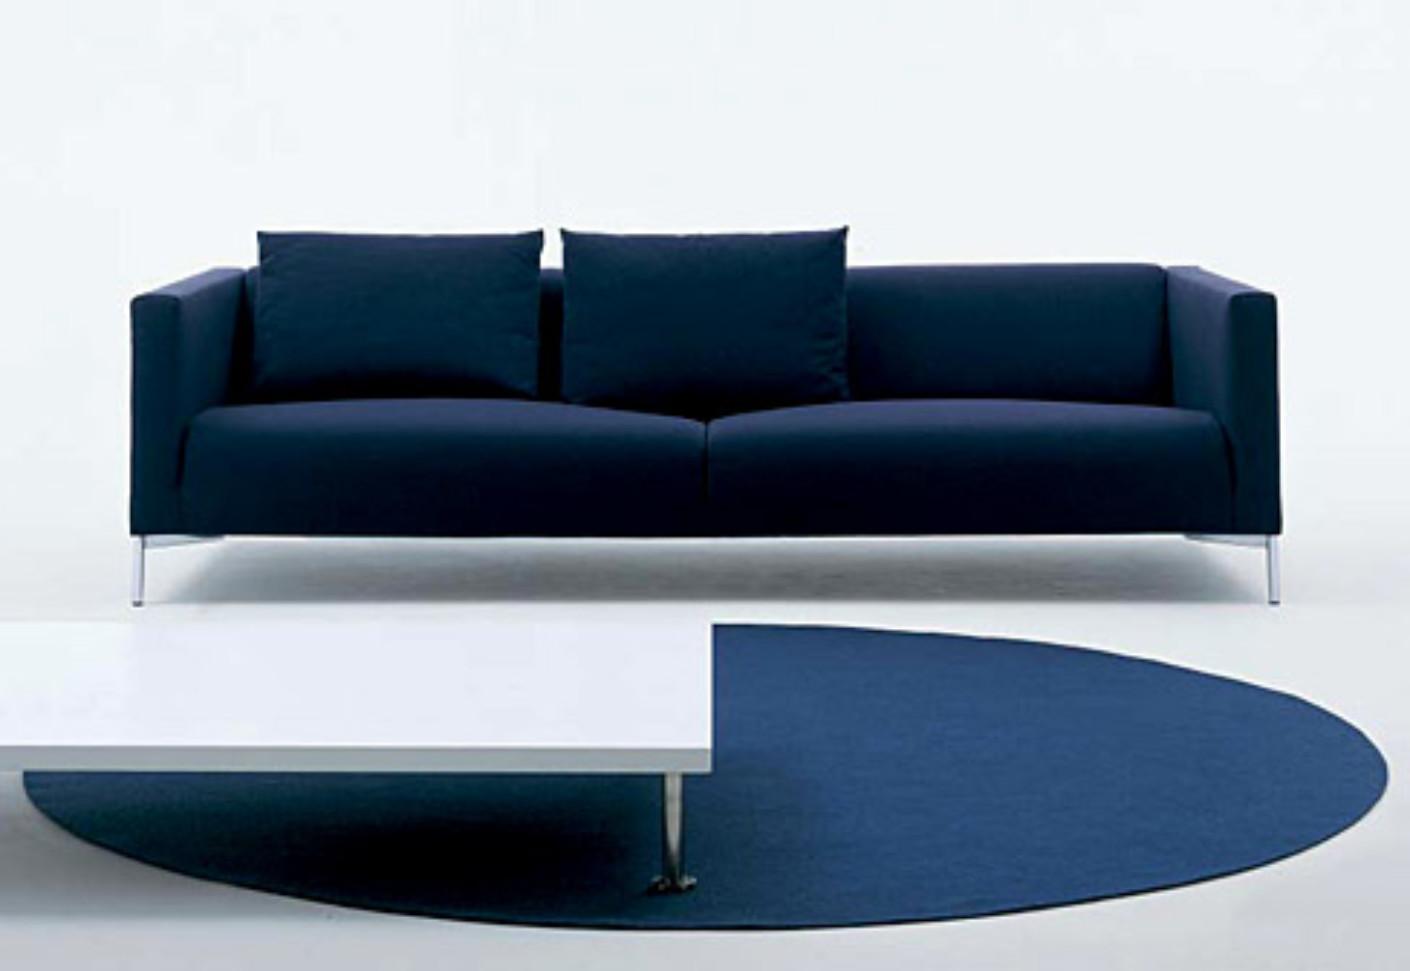 twin sofa by living divani stylepark. Black Bedroom Furniture Sets. Home Design Ideas